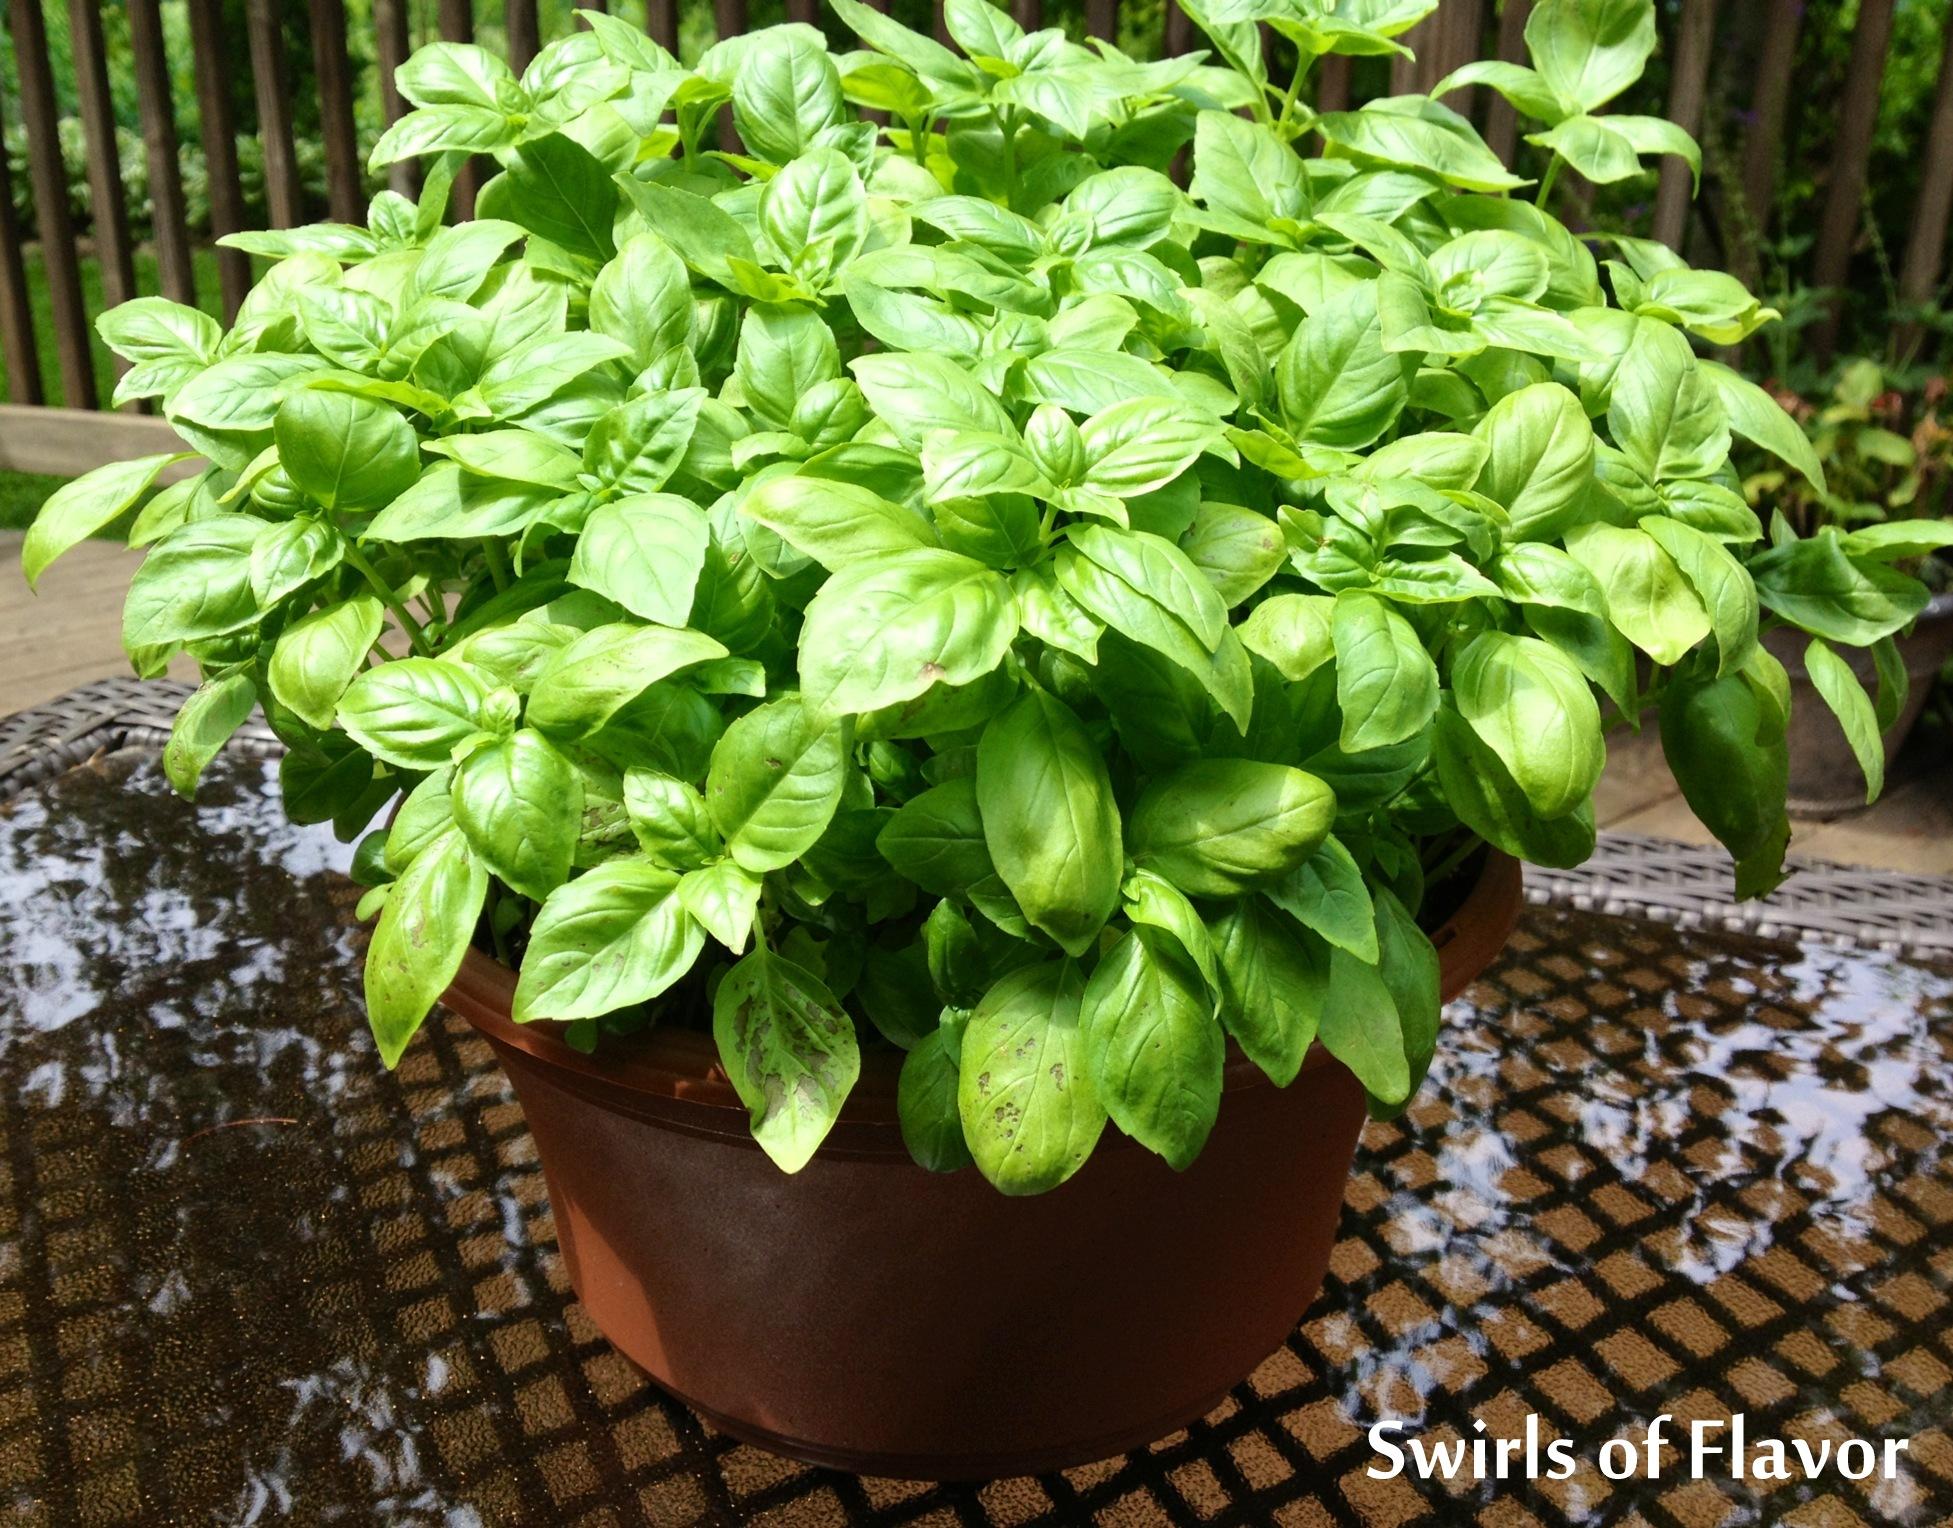 Fresh basil in a flower pot